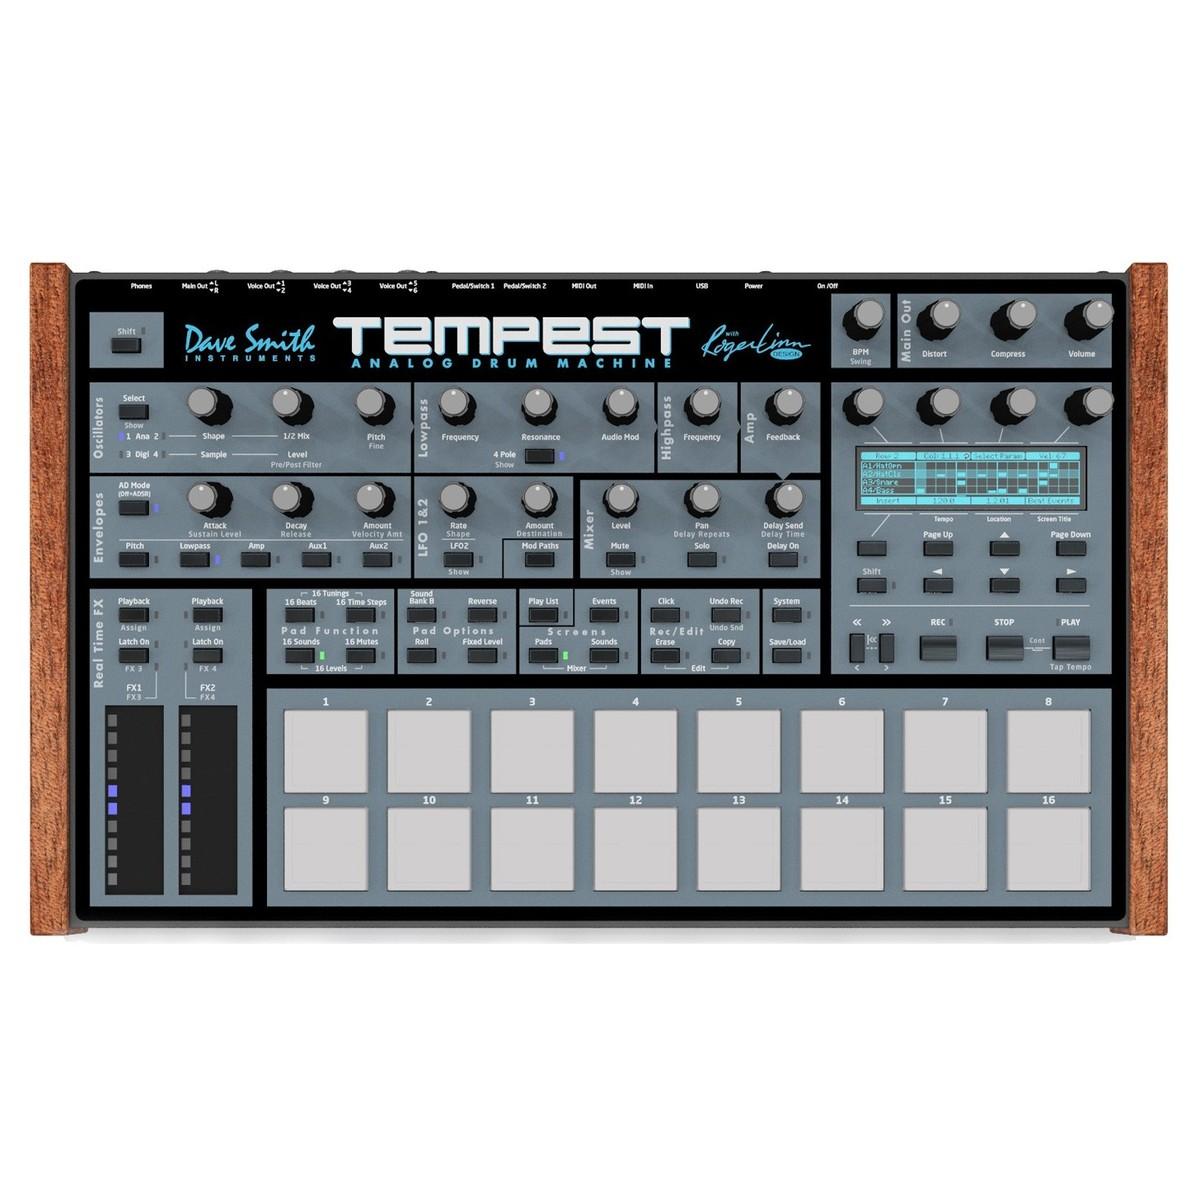 dave smith instruments tempest analog drum machine at gear4music. Black Bedroom Furniture Sets. Home Design Ideas